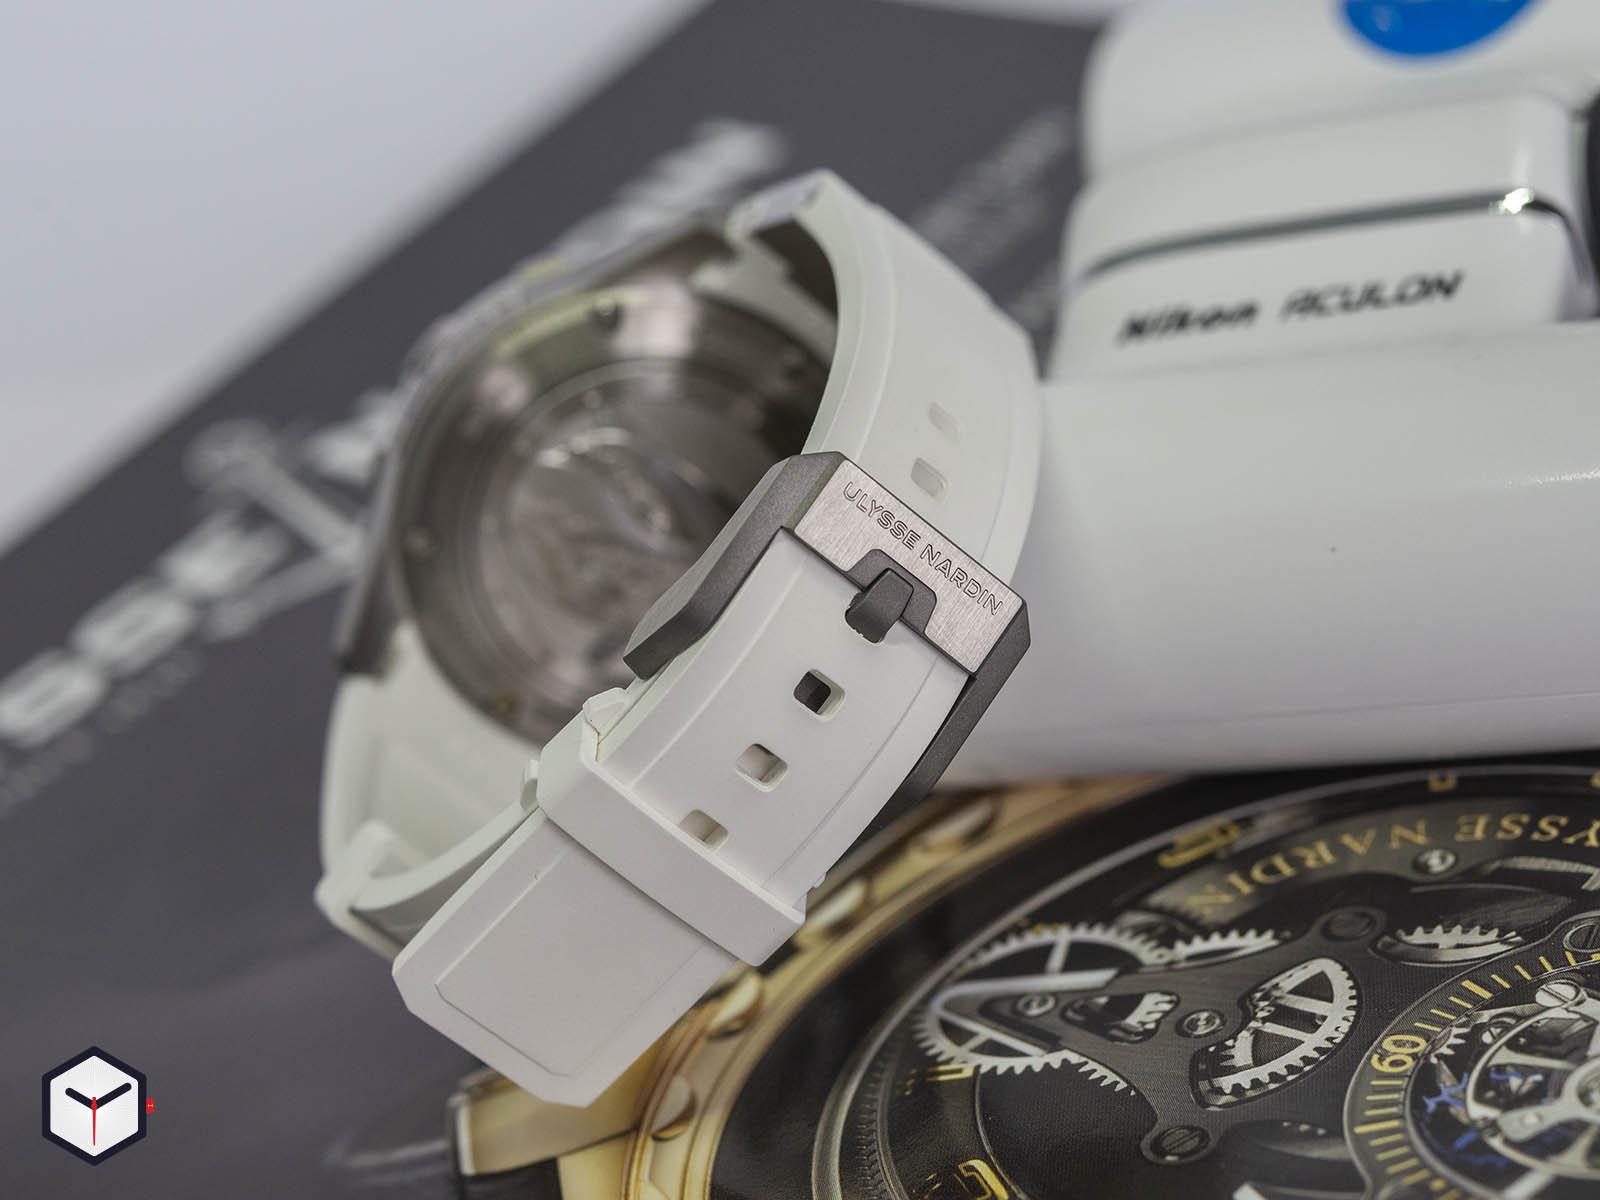 1183-170le-3-90-gw-ulysse-nardin-diver-chronometer-6.jpg